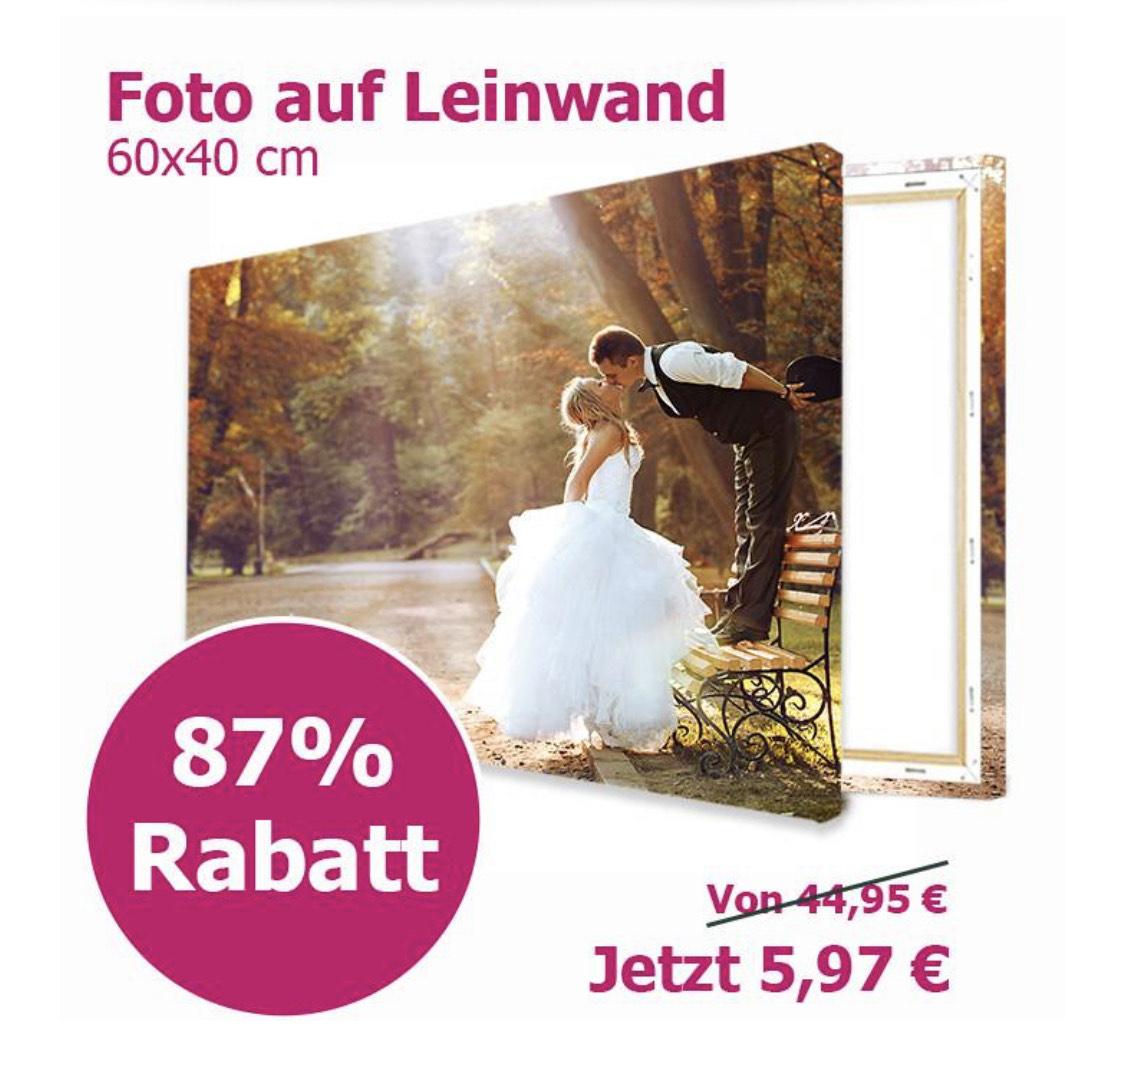 Lieblingsfoto.de Leinwand 60x40 cm für 12,92€